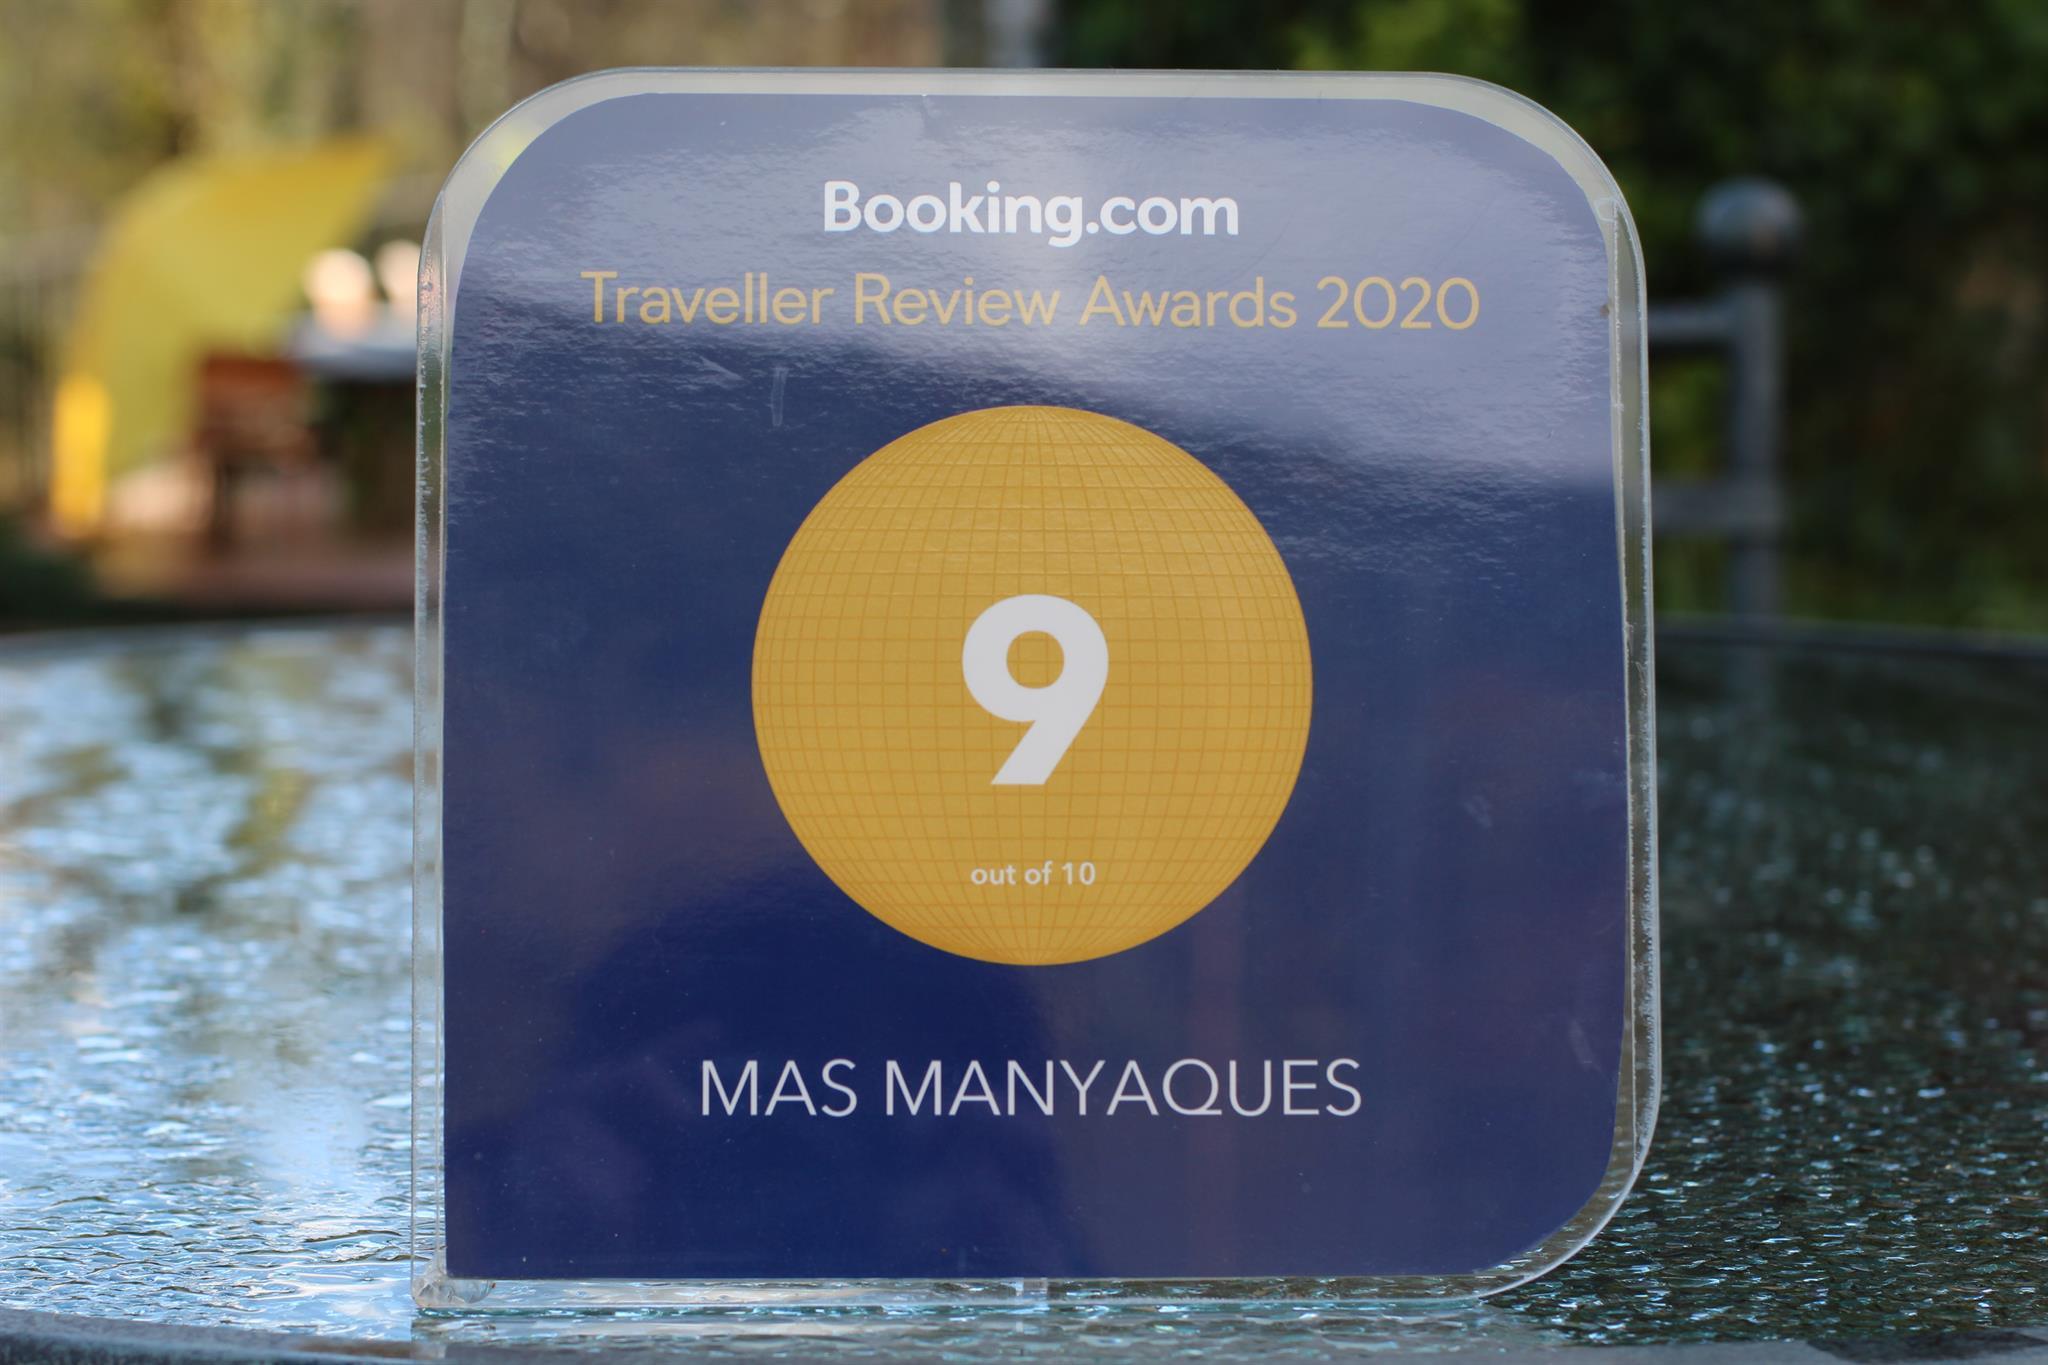 MAS MANYAQUES - LA TERRASSE © @gitesdefrance66